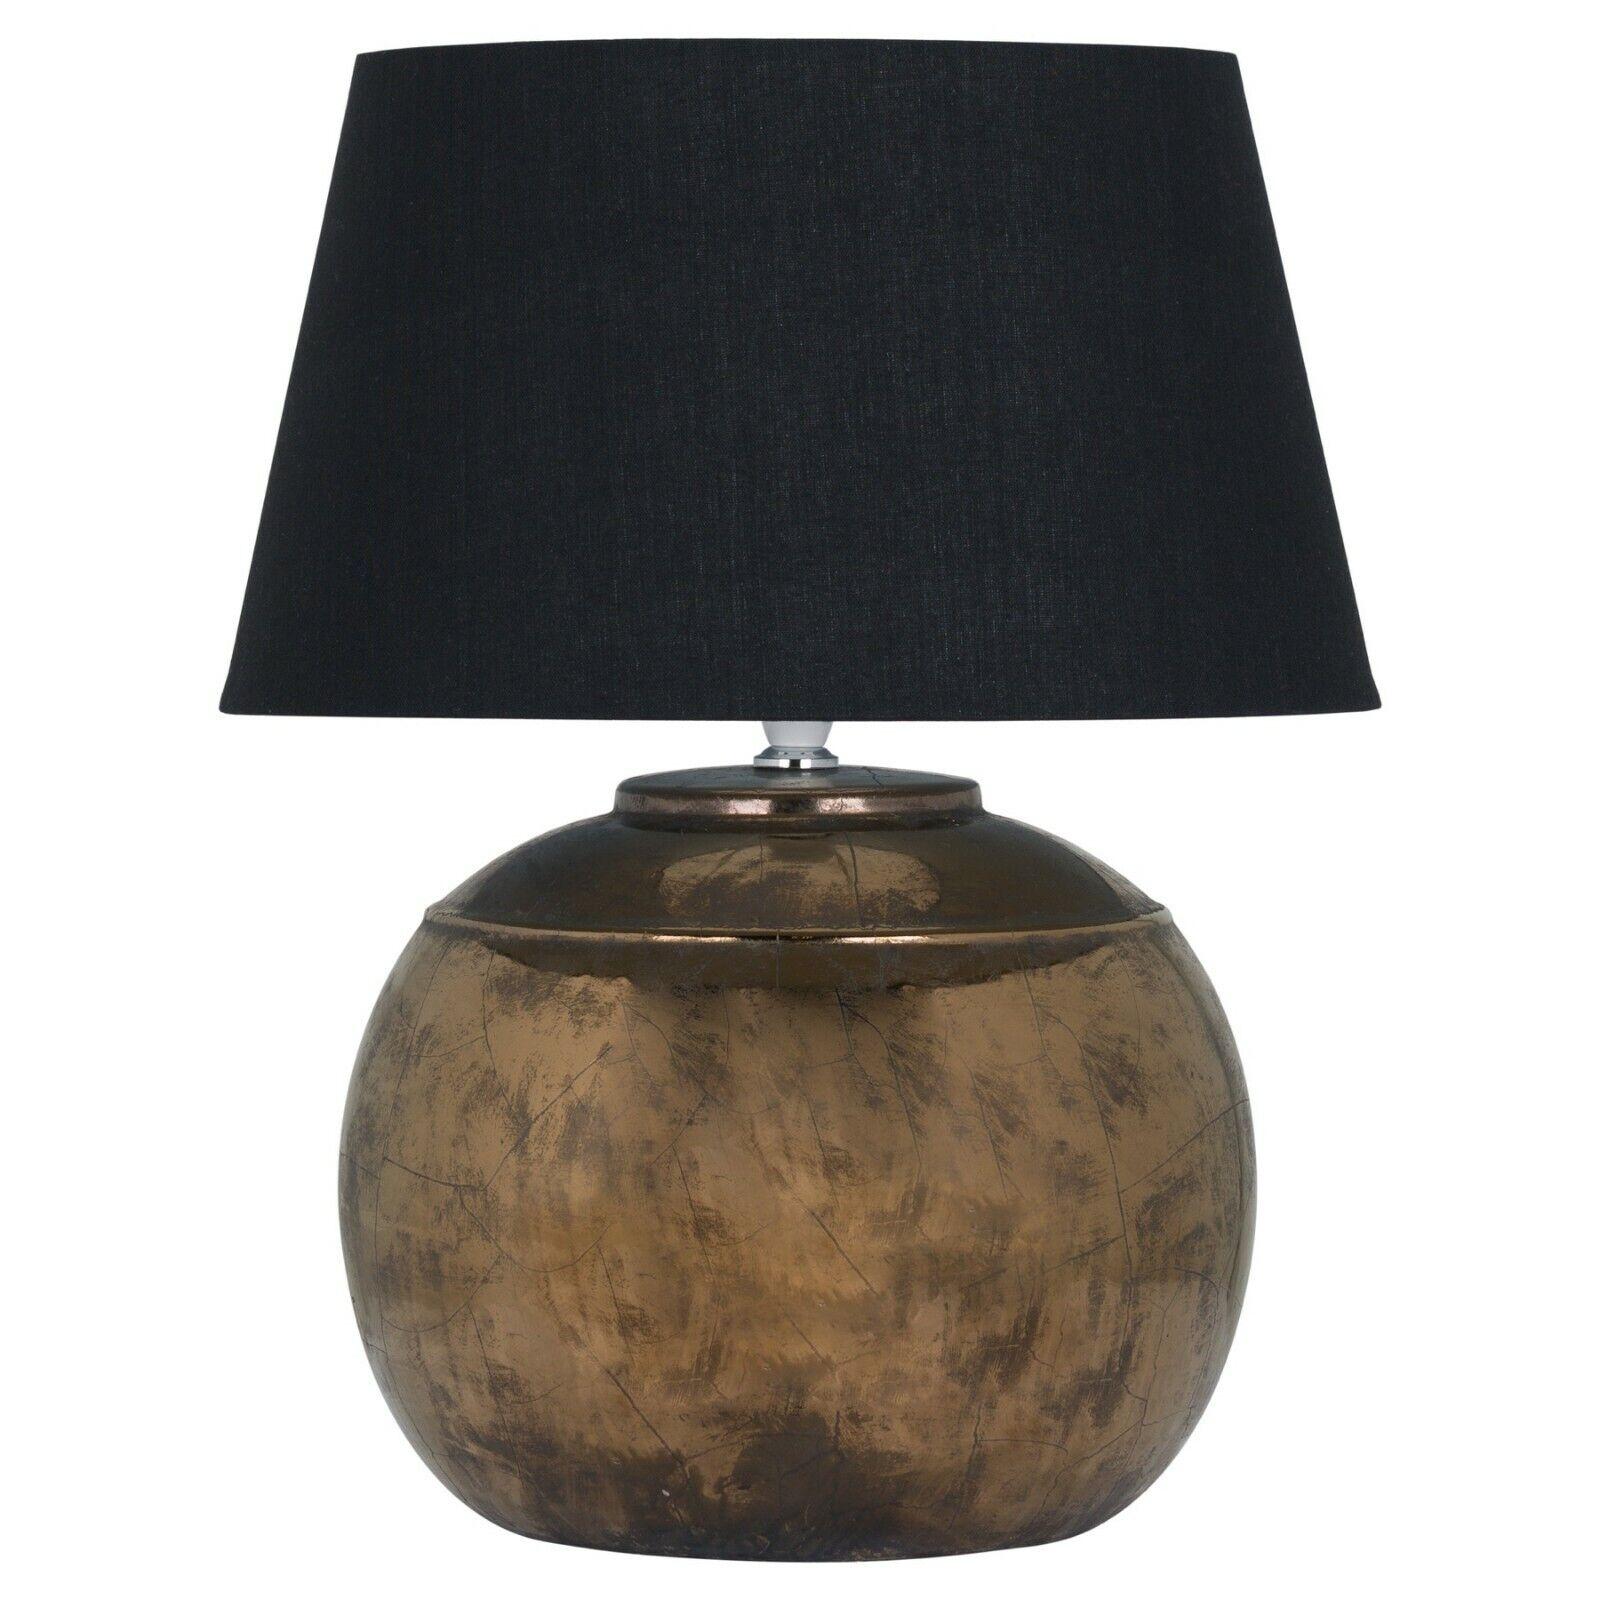 Distressed Round Bronze Copper Black Ceramic Table Desk Lamp 40cm (H19425)